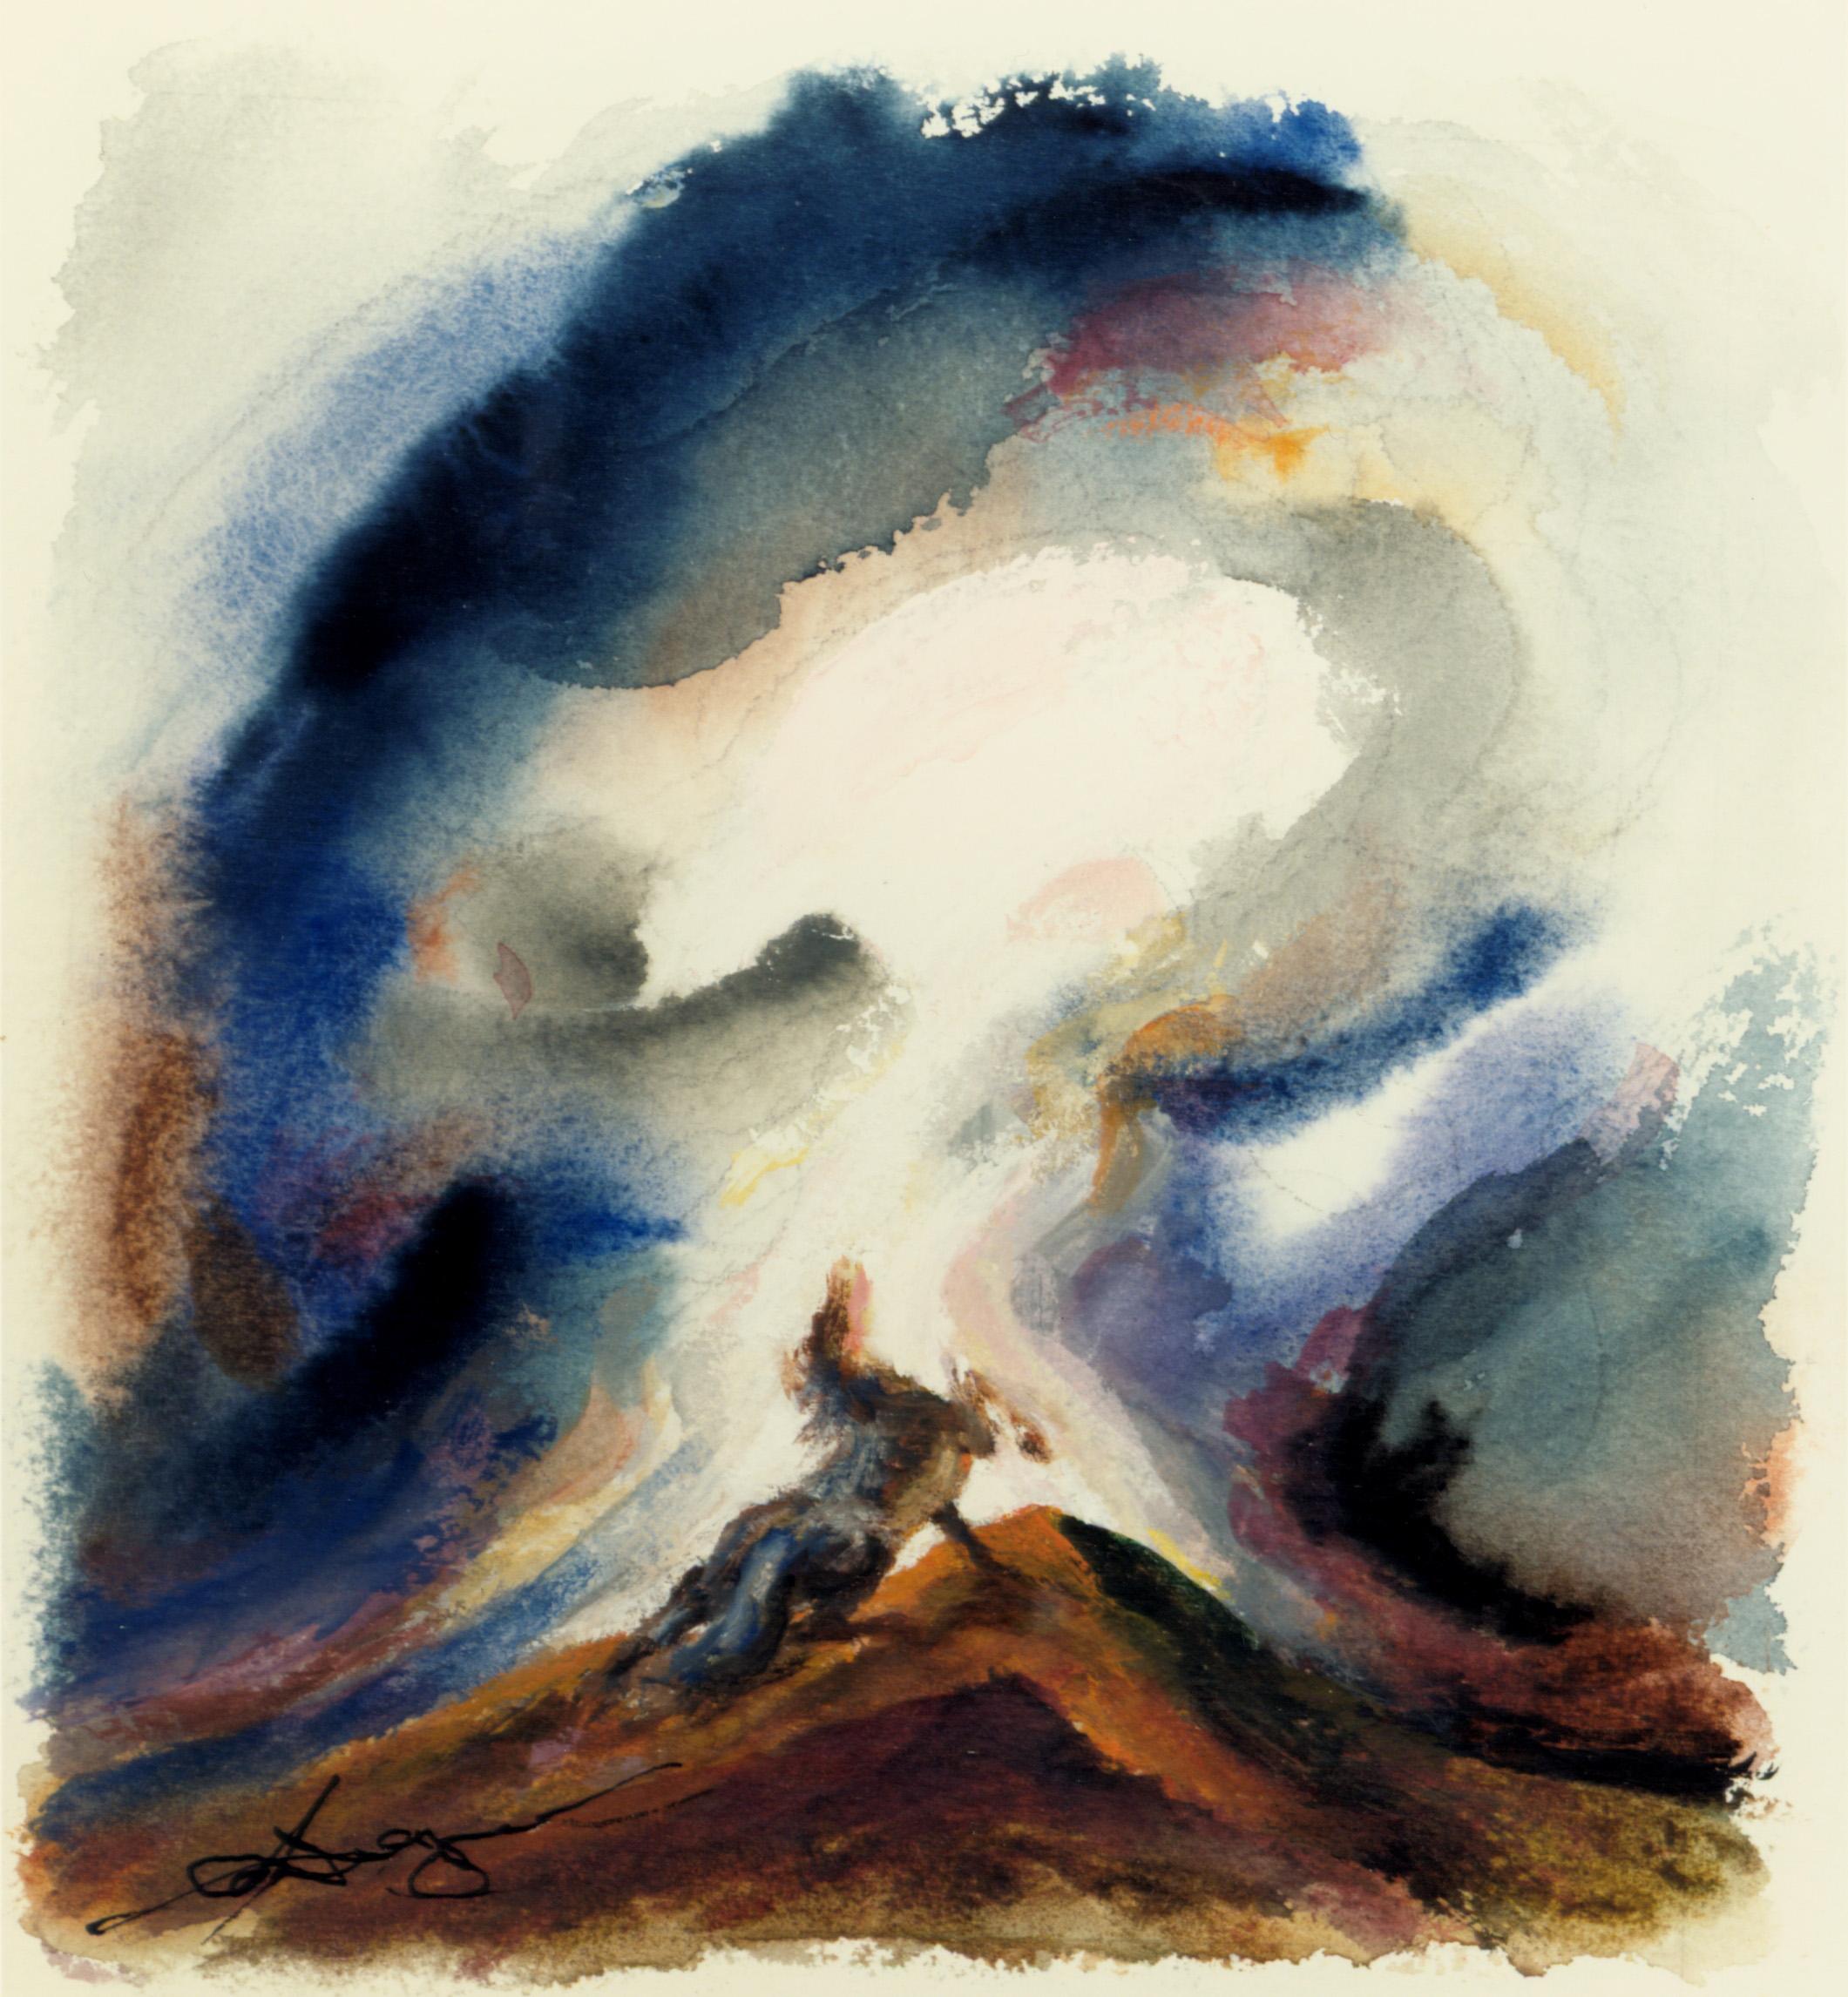 (Watercolor, Gouache, 10 x 9 in.)